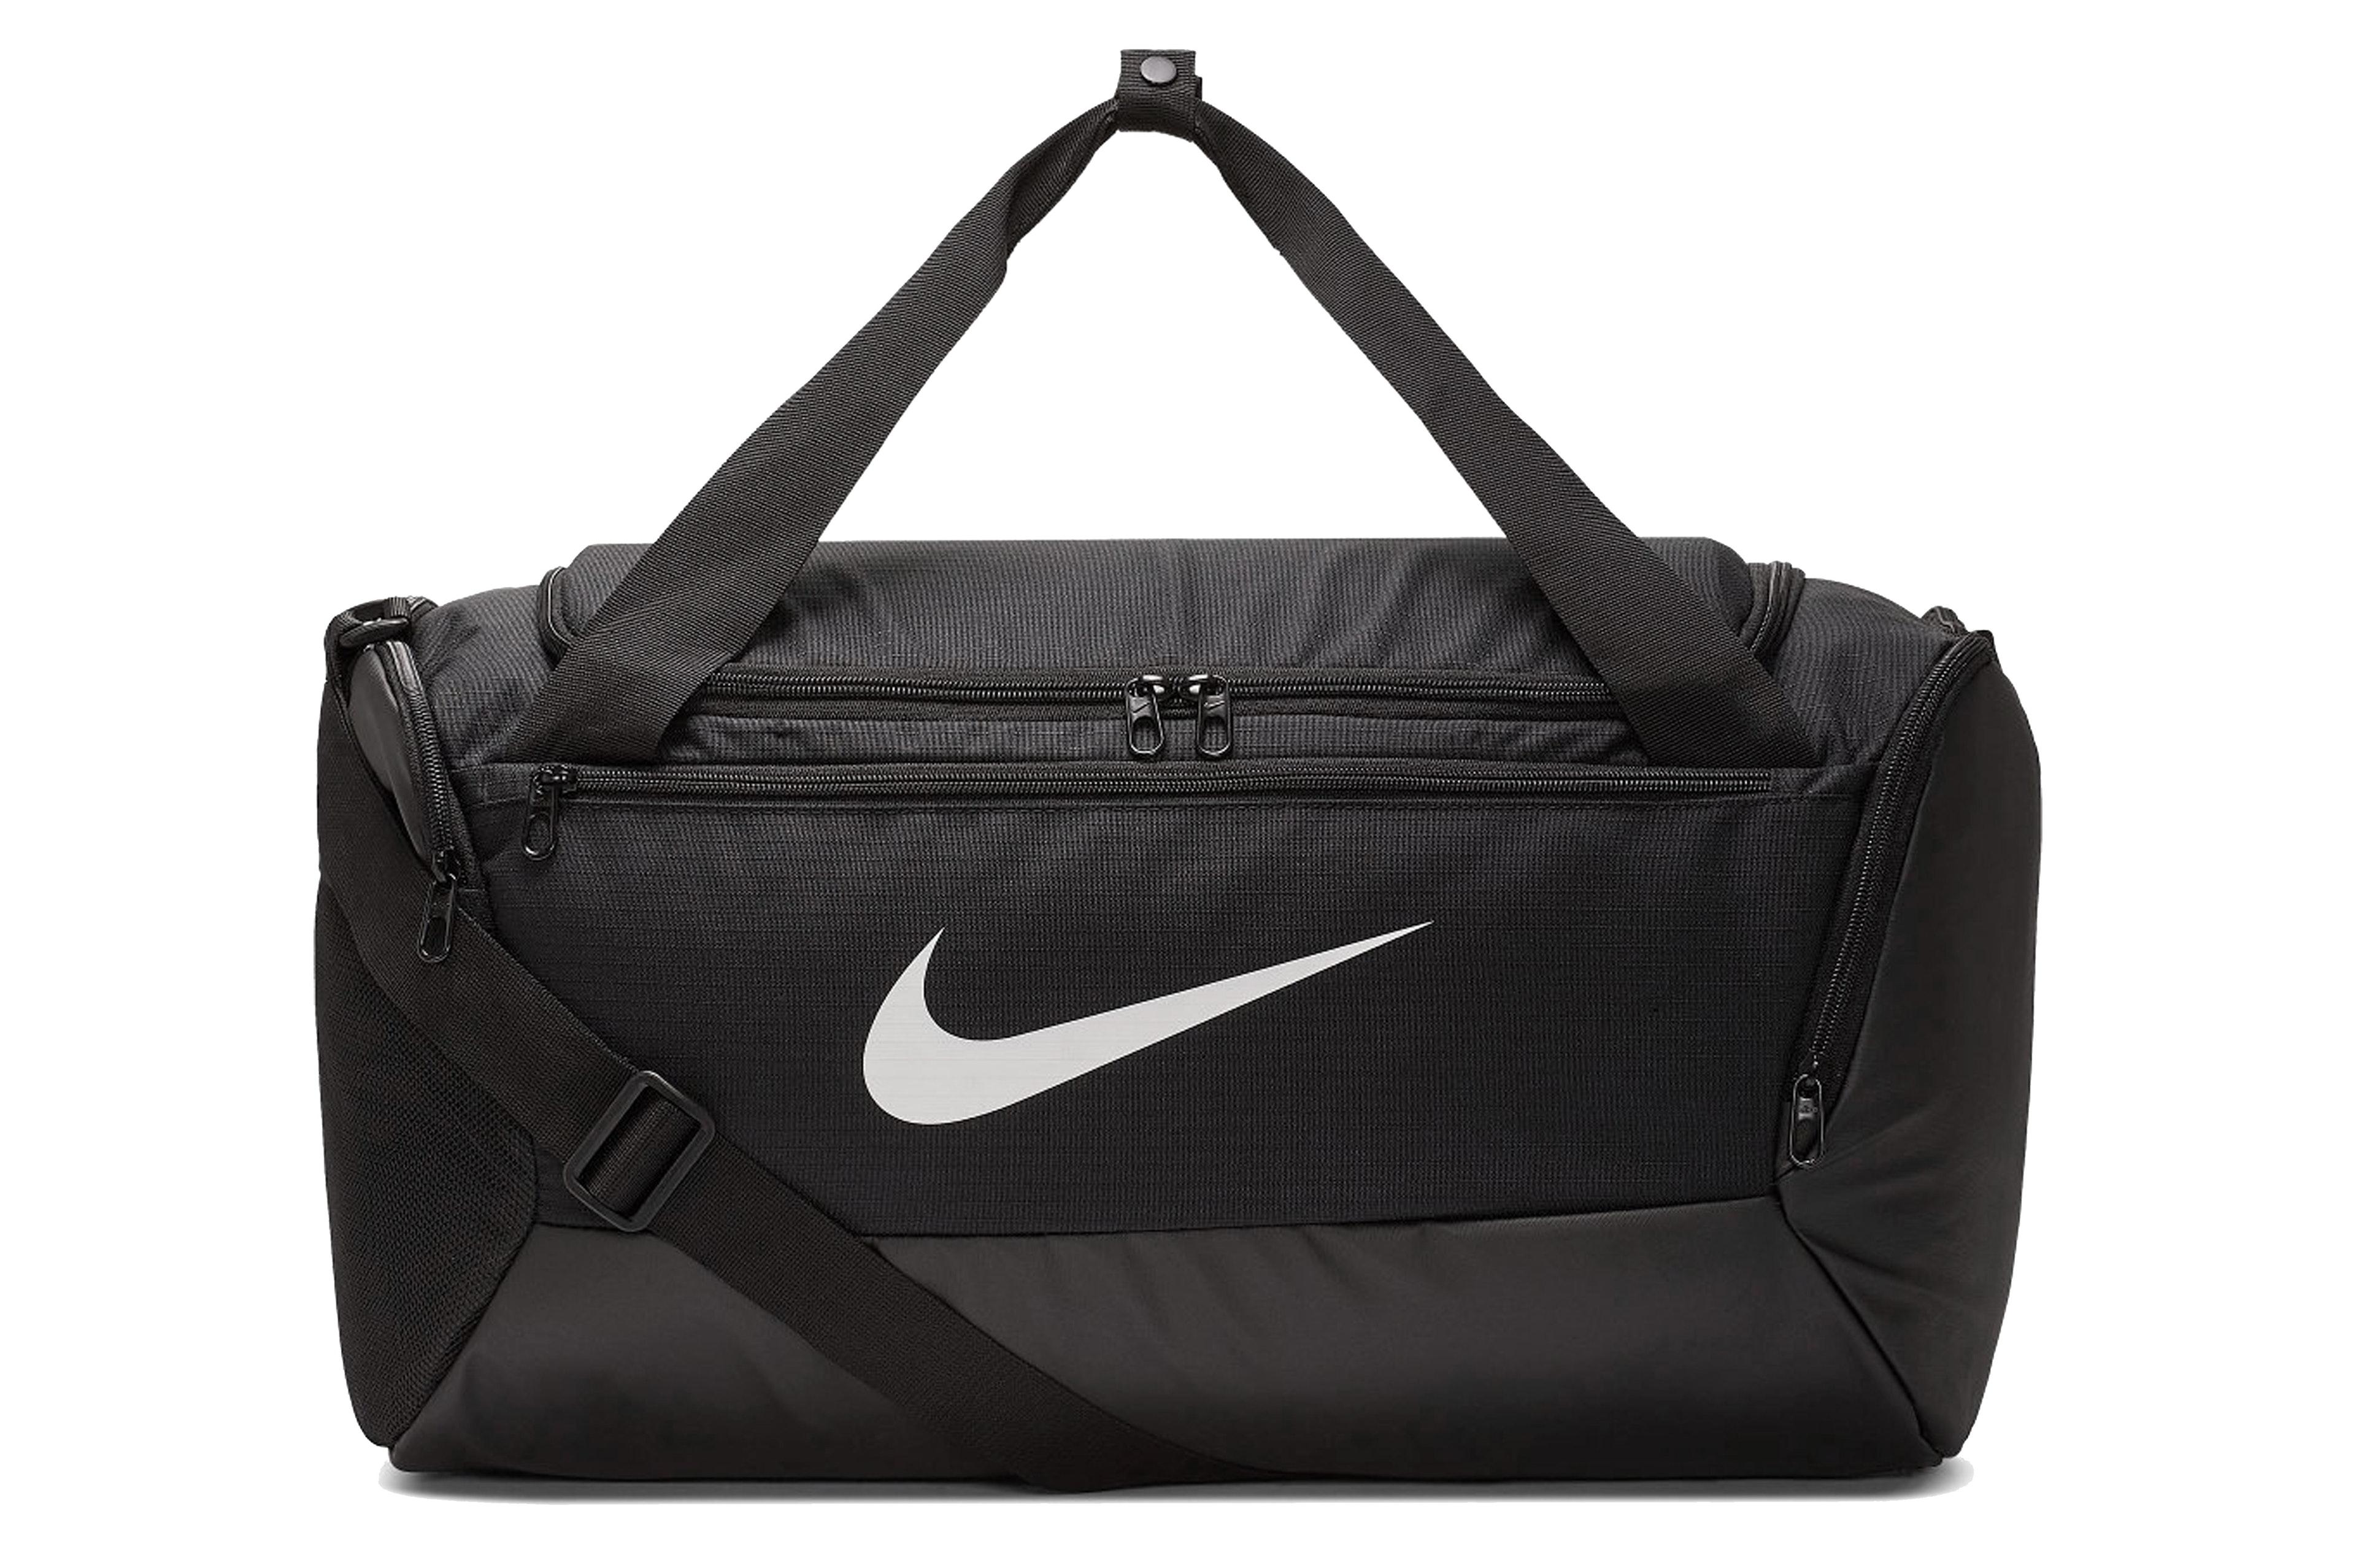 Nike NK BRSLA S DUFF - 9.0 (41L) BA5957-010